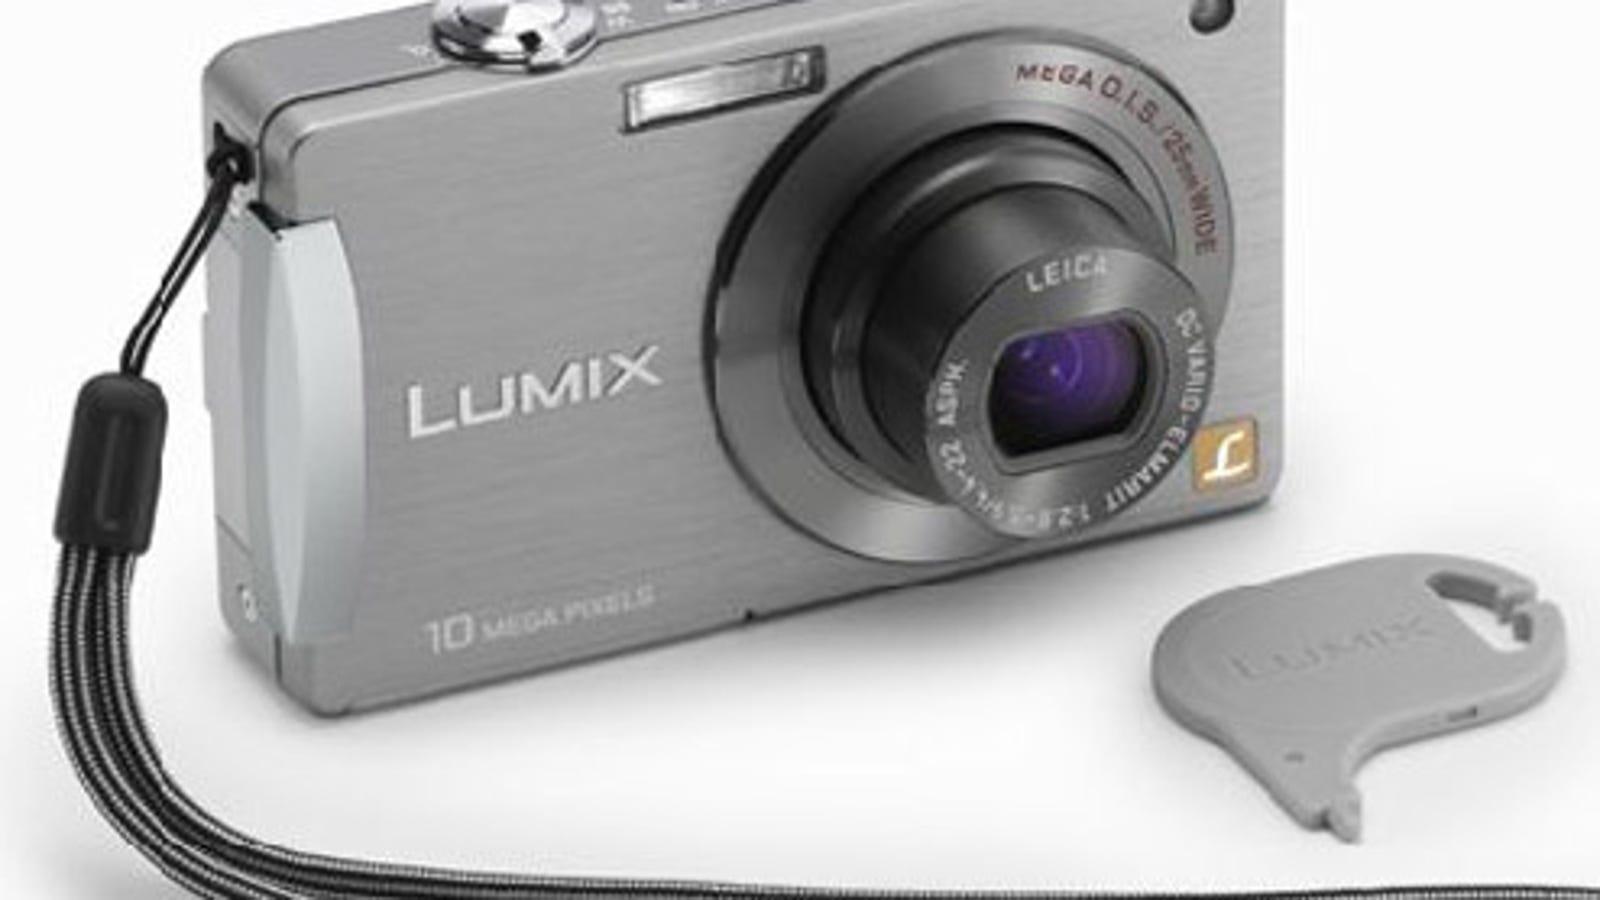 LUMIX FX500 DOWNLOAD DRIVERS